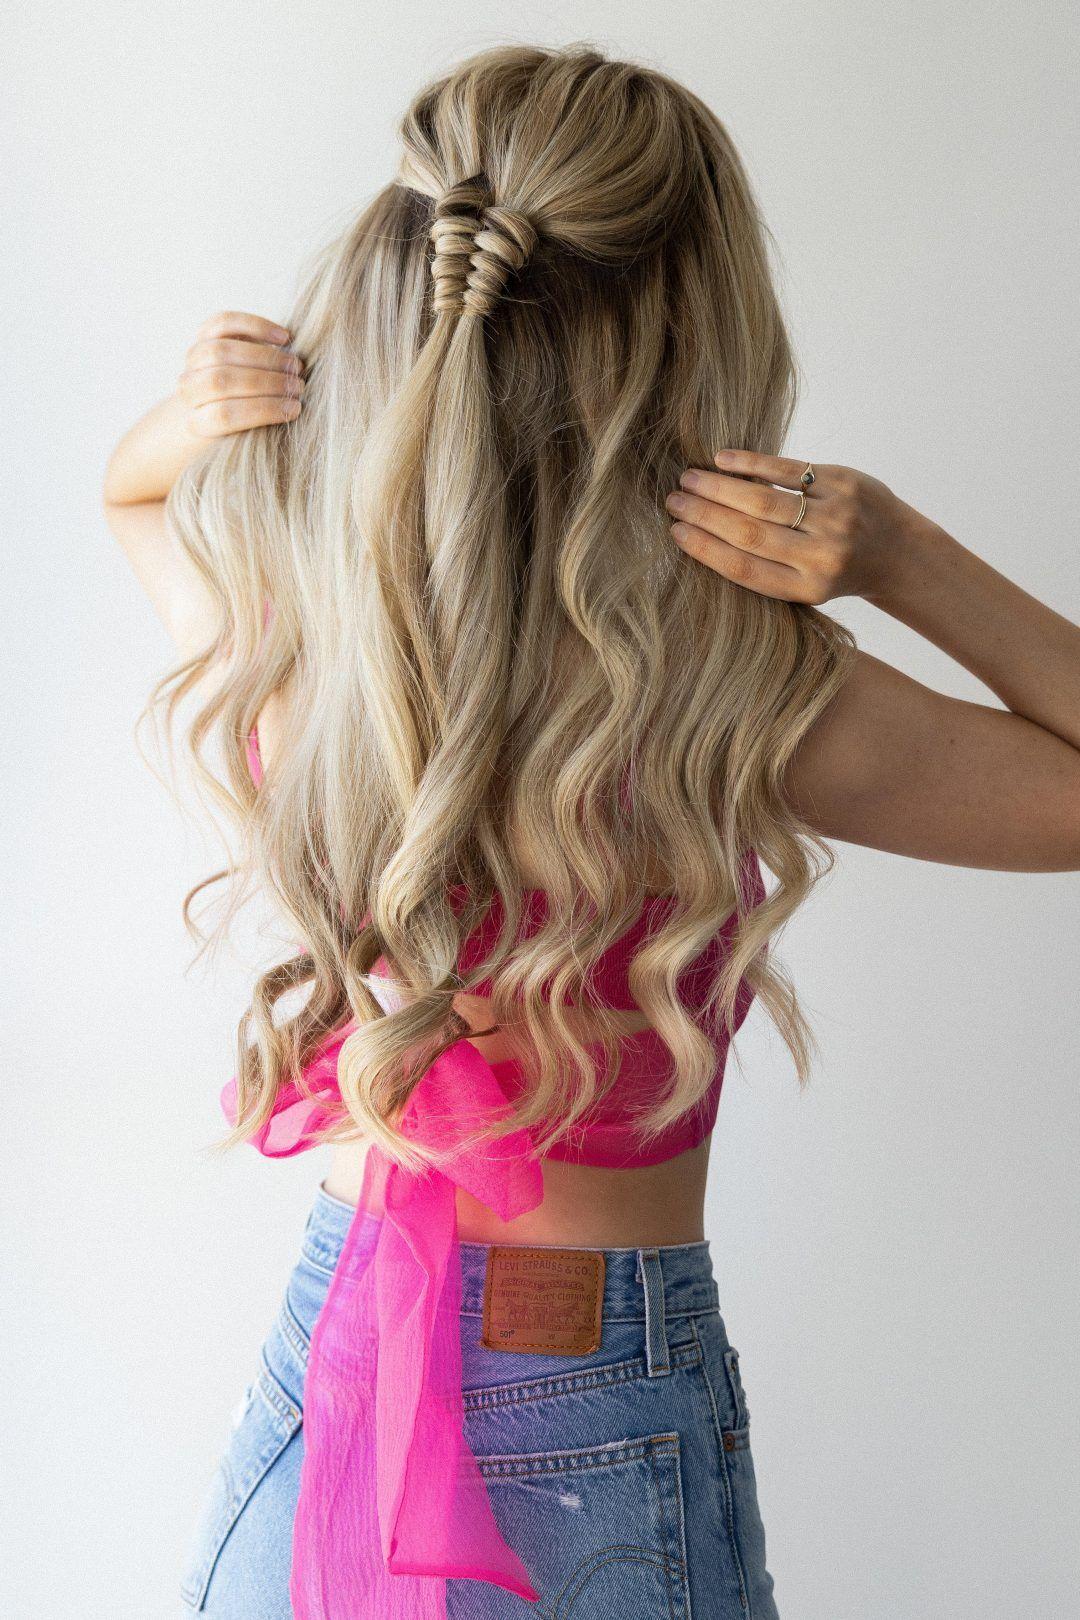 Easy Spring Hairstyles 2020 Cute Quick Simple Alex Gaboury Hair Styles Spring Hairstyles Hairdo For Long Hair